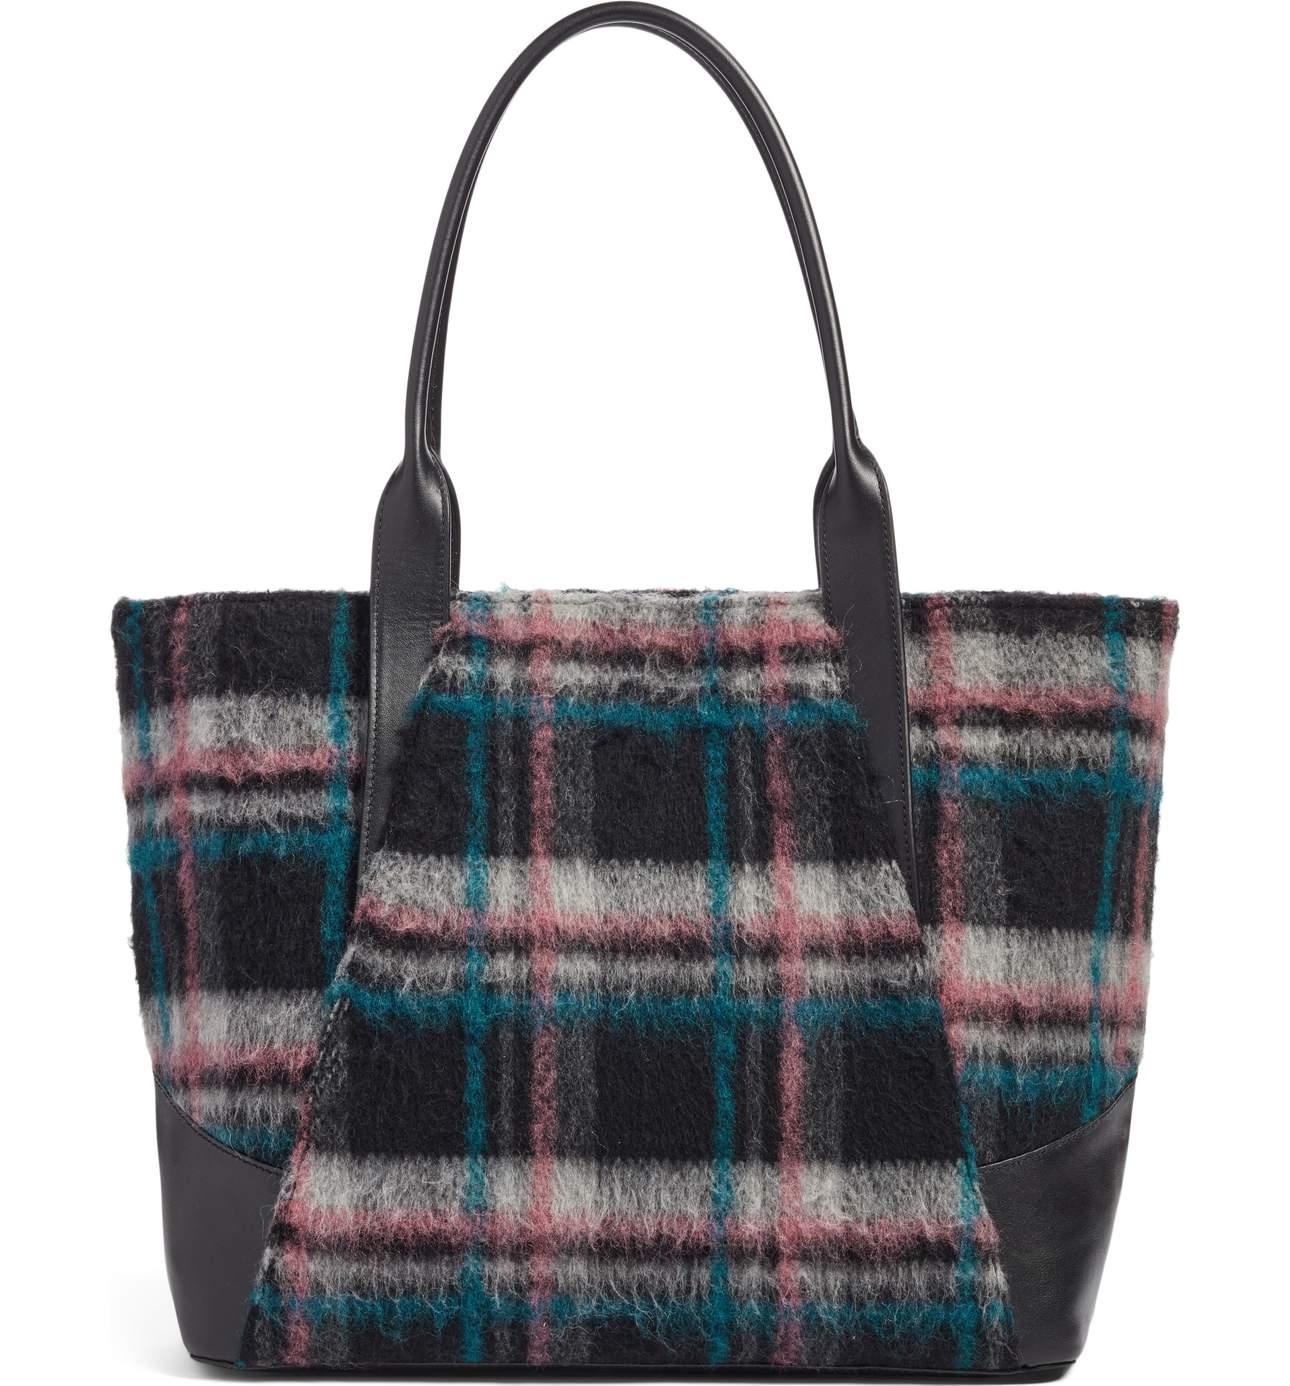 Treasure & BondAshton Plaid Wool & Leather Tote